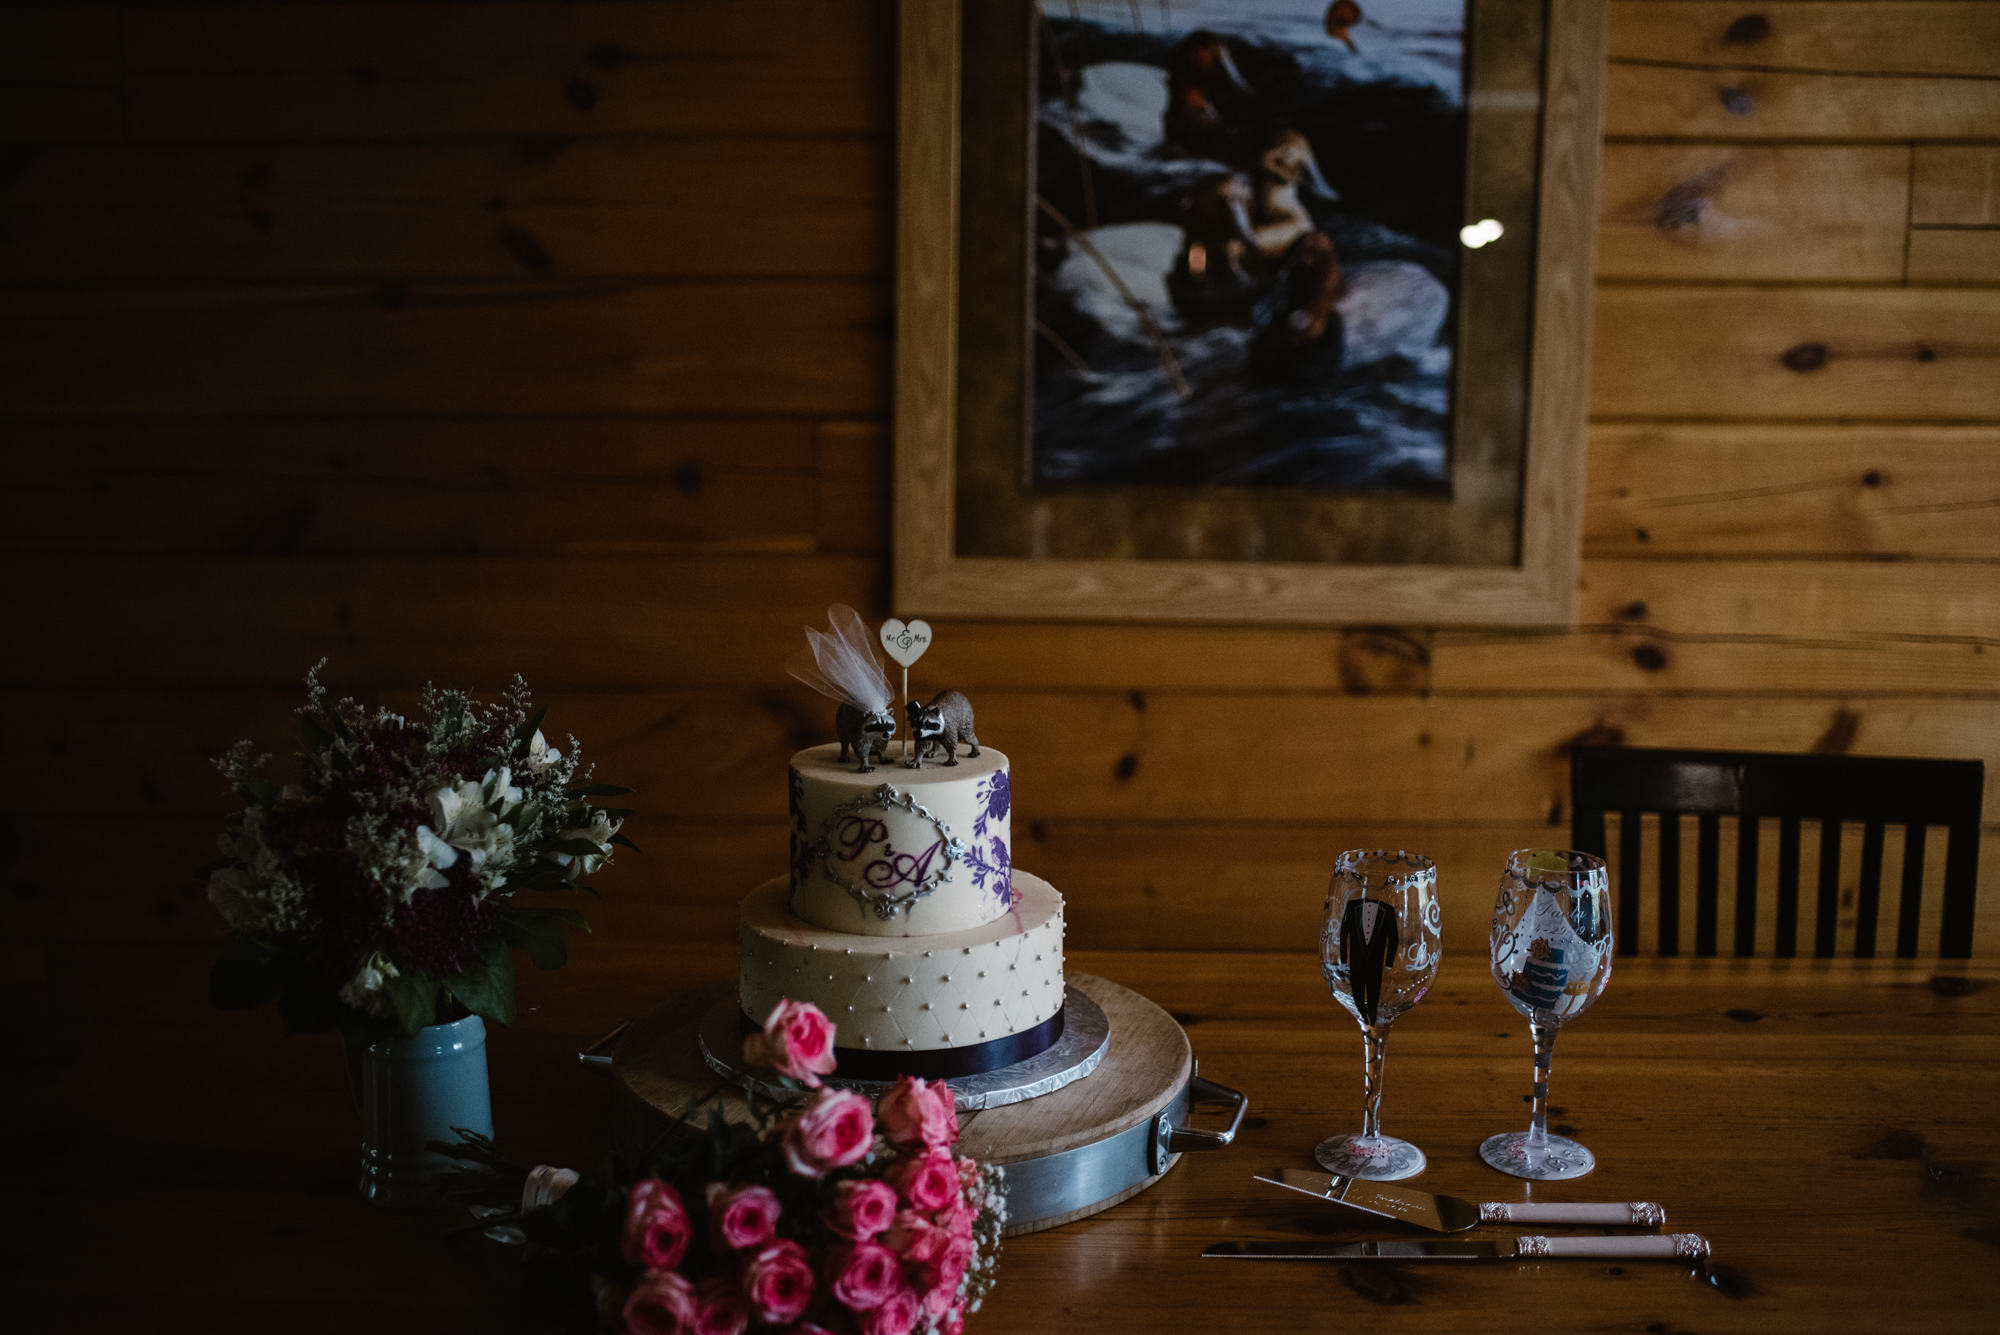 Paula and Andrew - Small Adventurous Wedding in Shenandoah National Park - Blue Ridge Mountain Wedding - White Sails Creative - Mountain Elopement_56.jpg